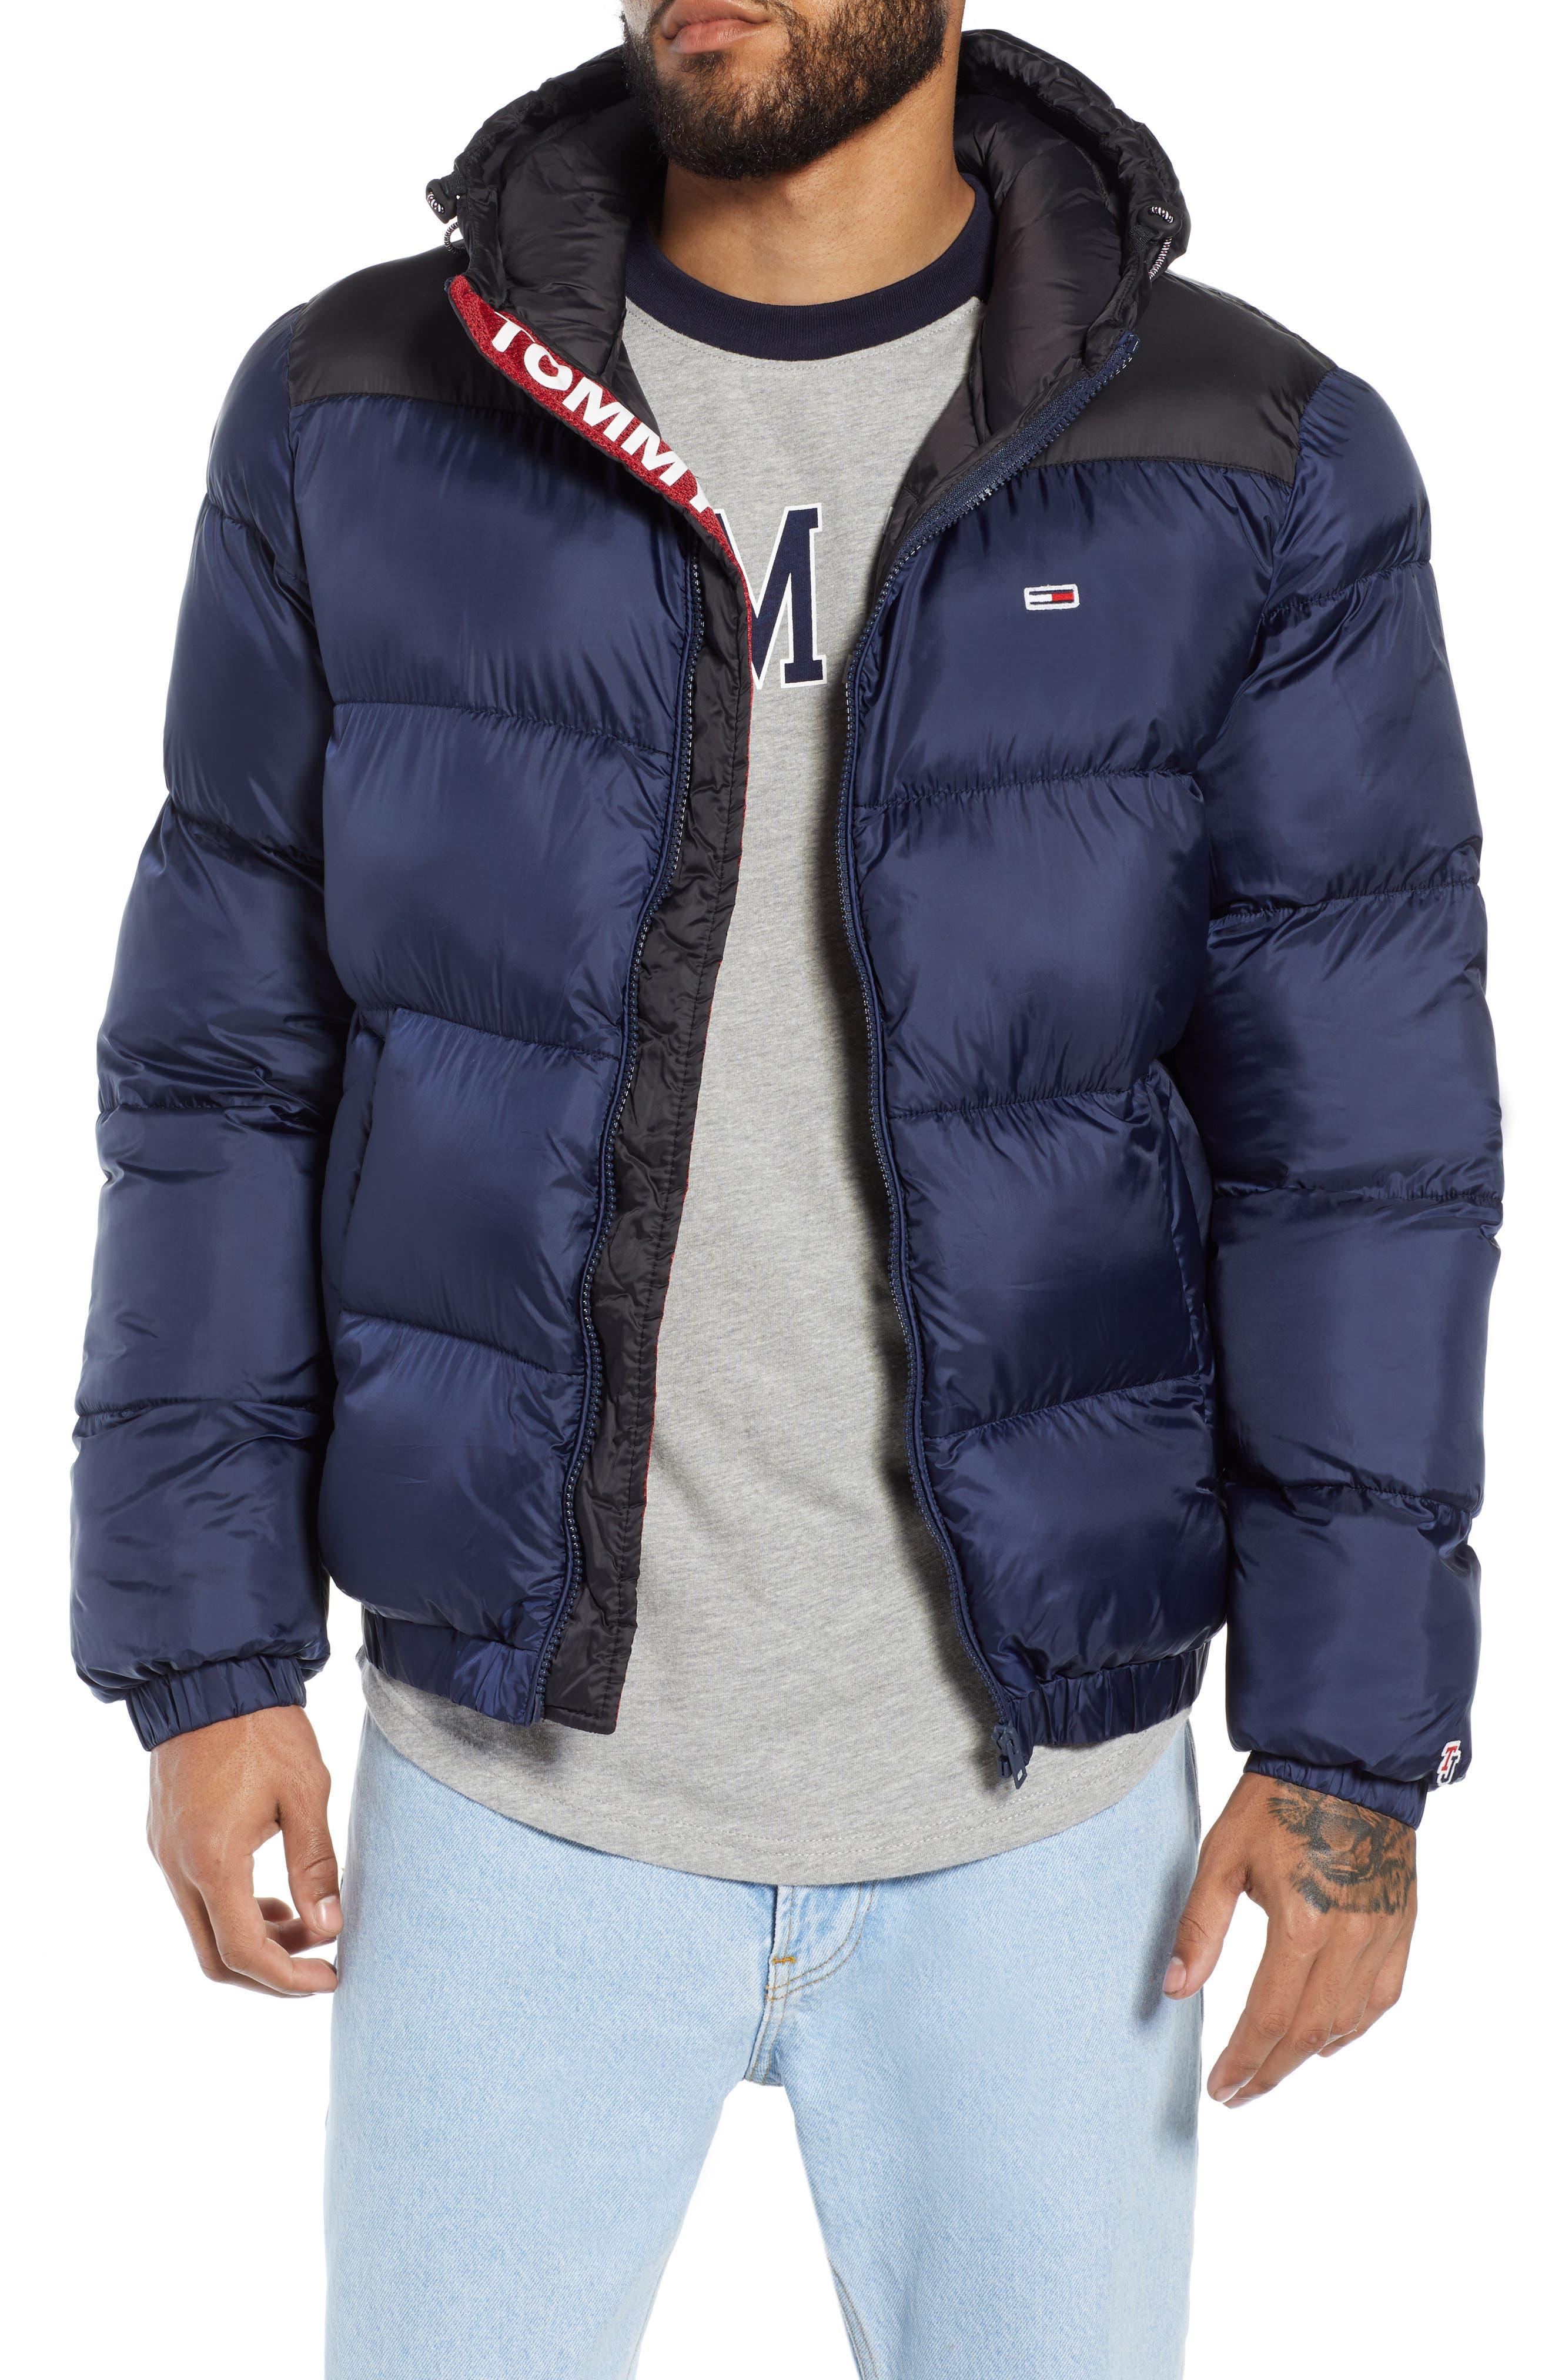 Classics Hooded Jacket,                             Main thumbnail 1, color,                             400